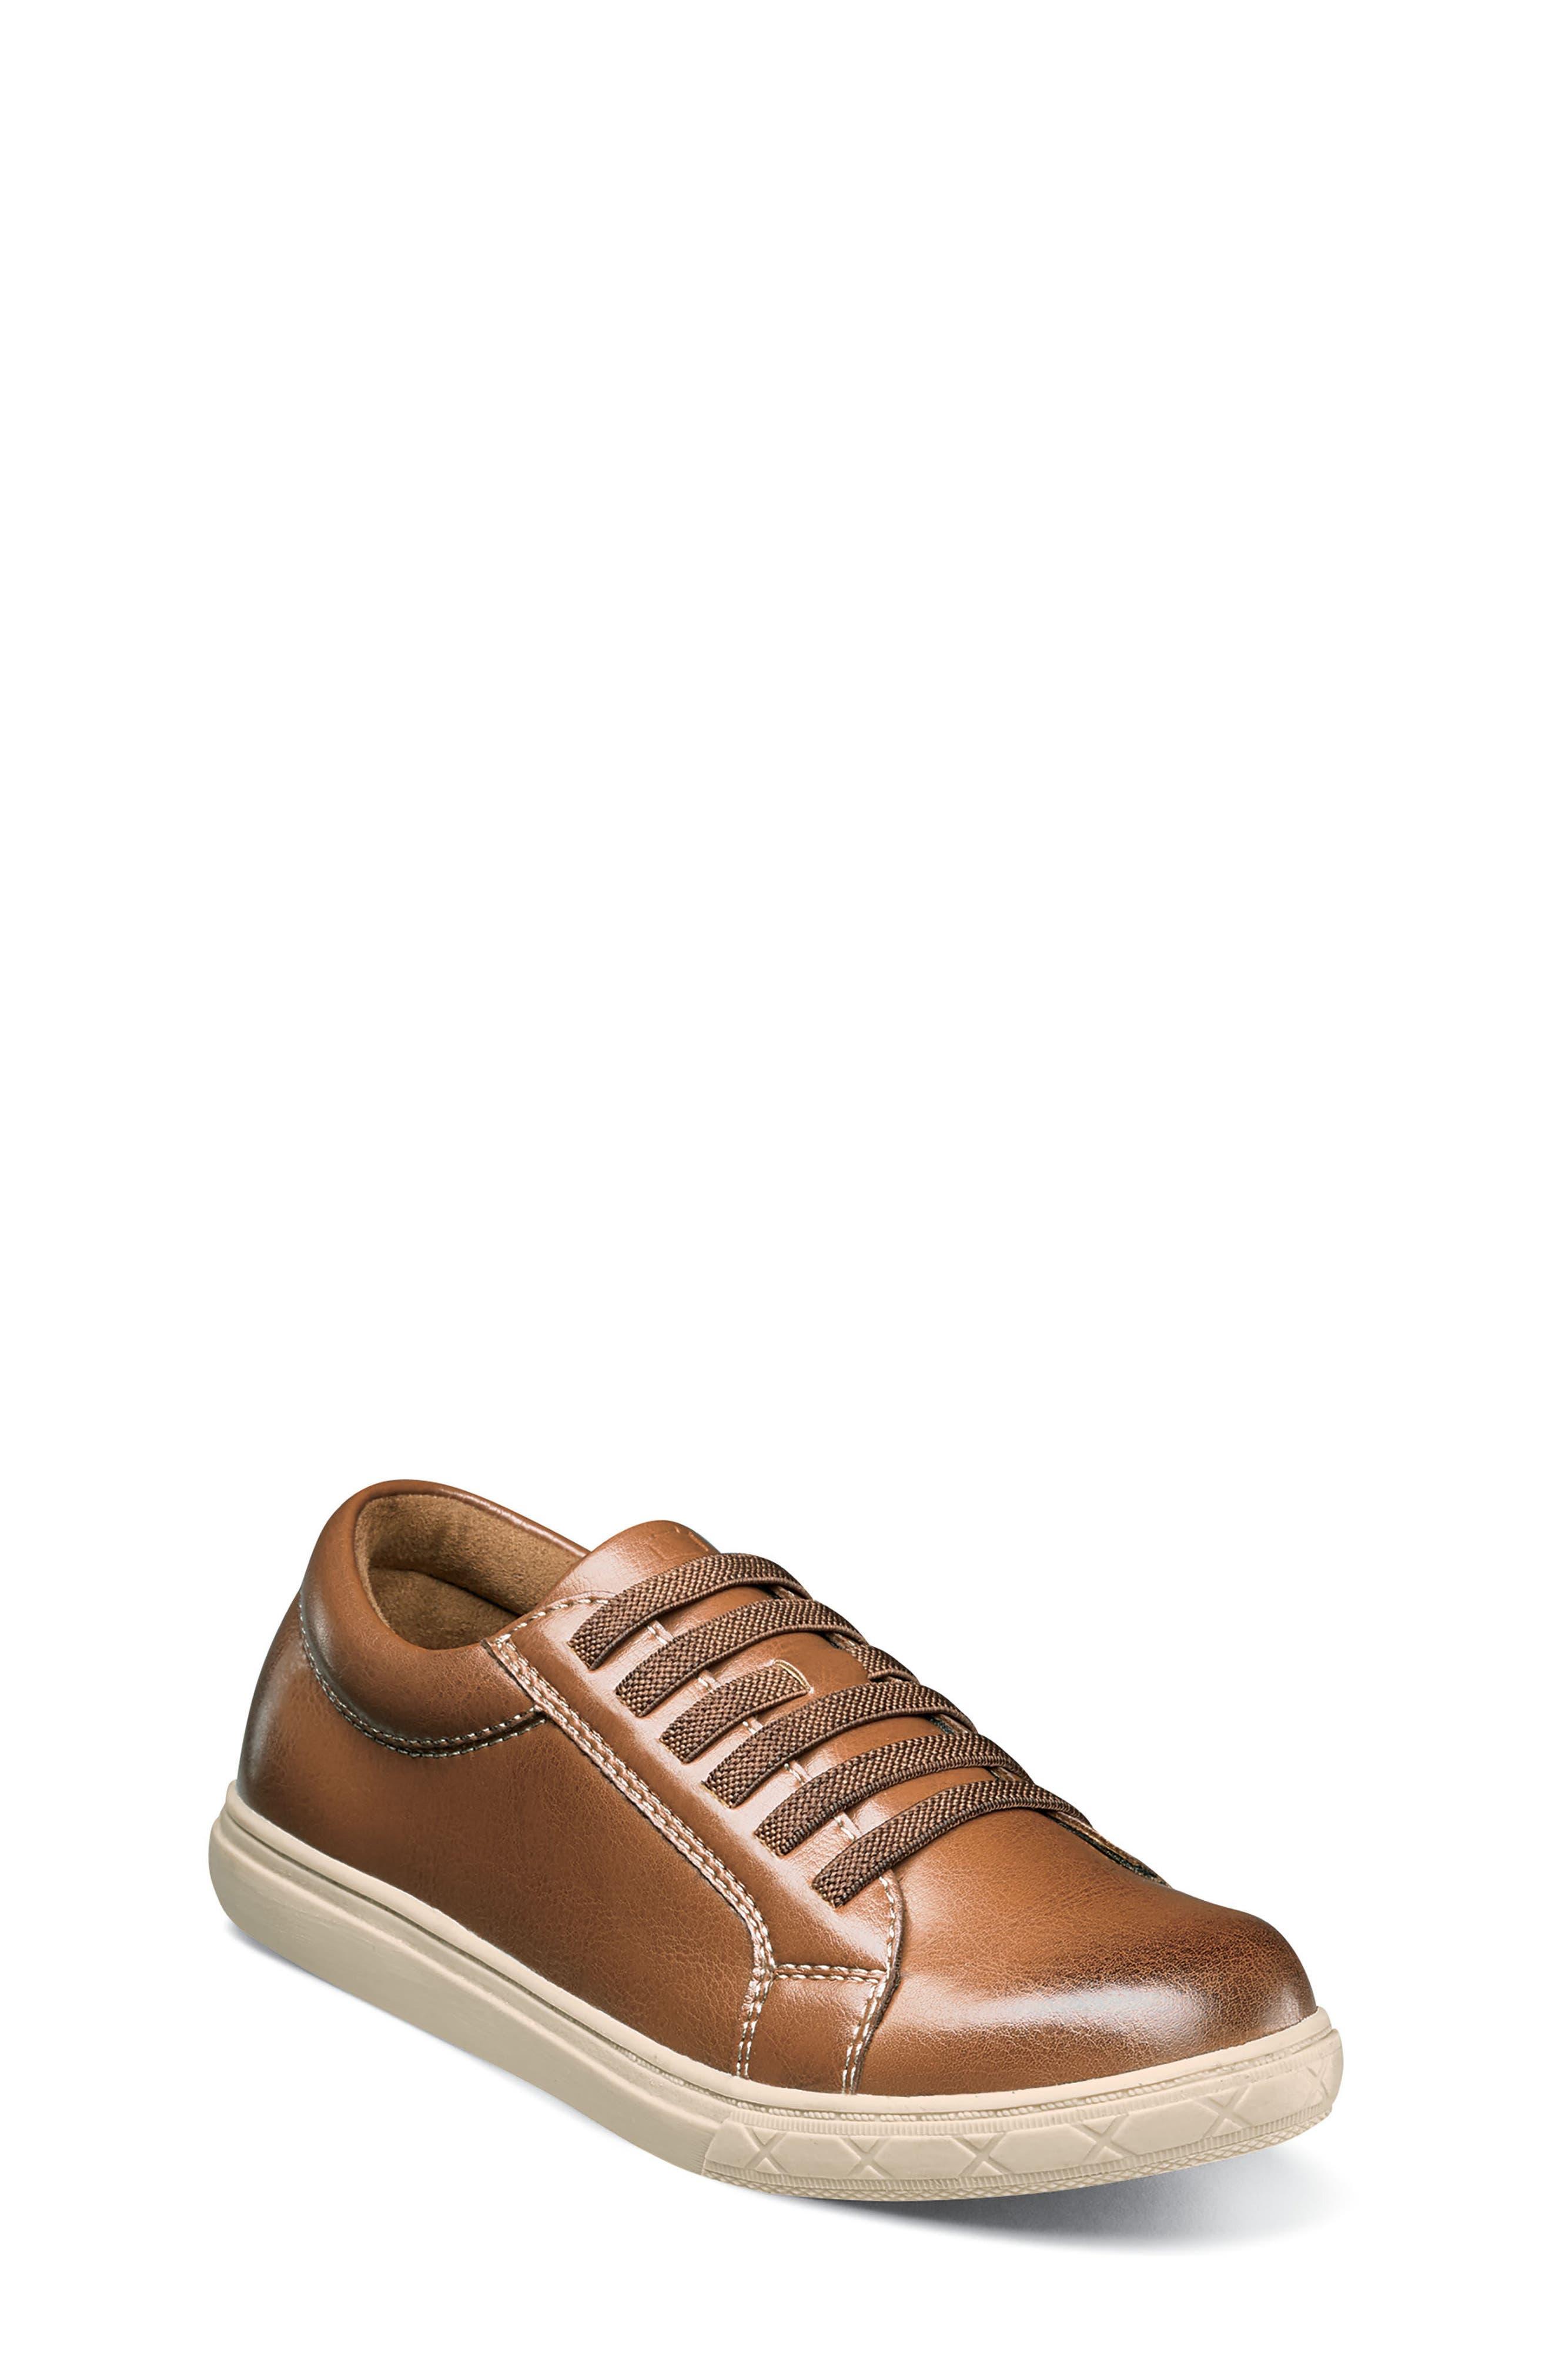 Curb Elastic Lace Sneaker,                         Main,                         color, Cognac